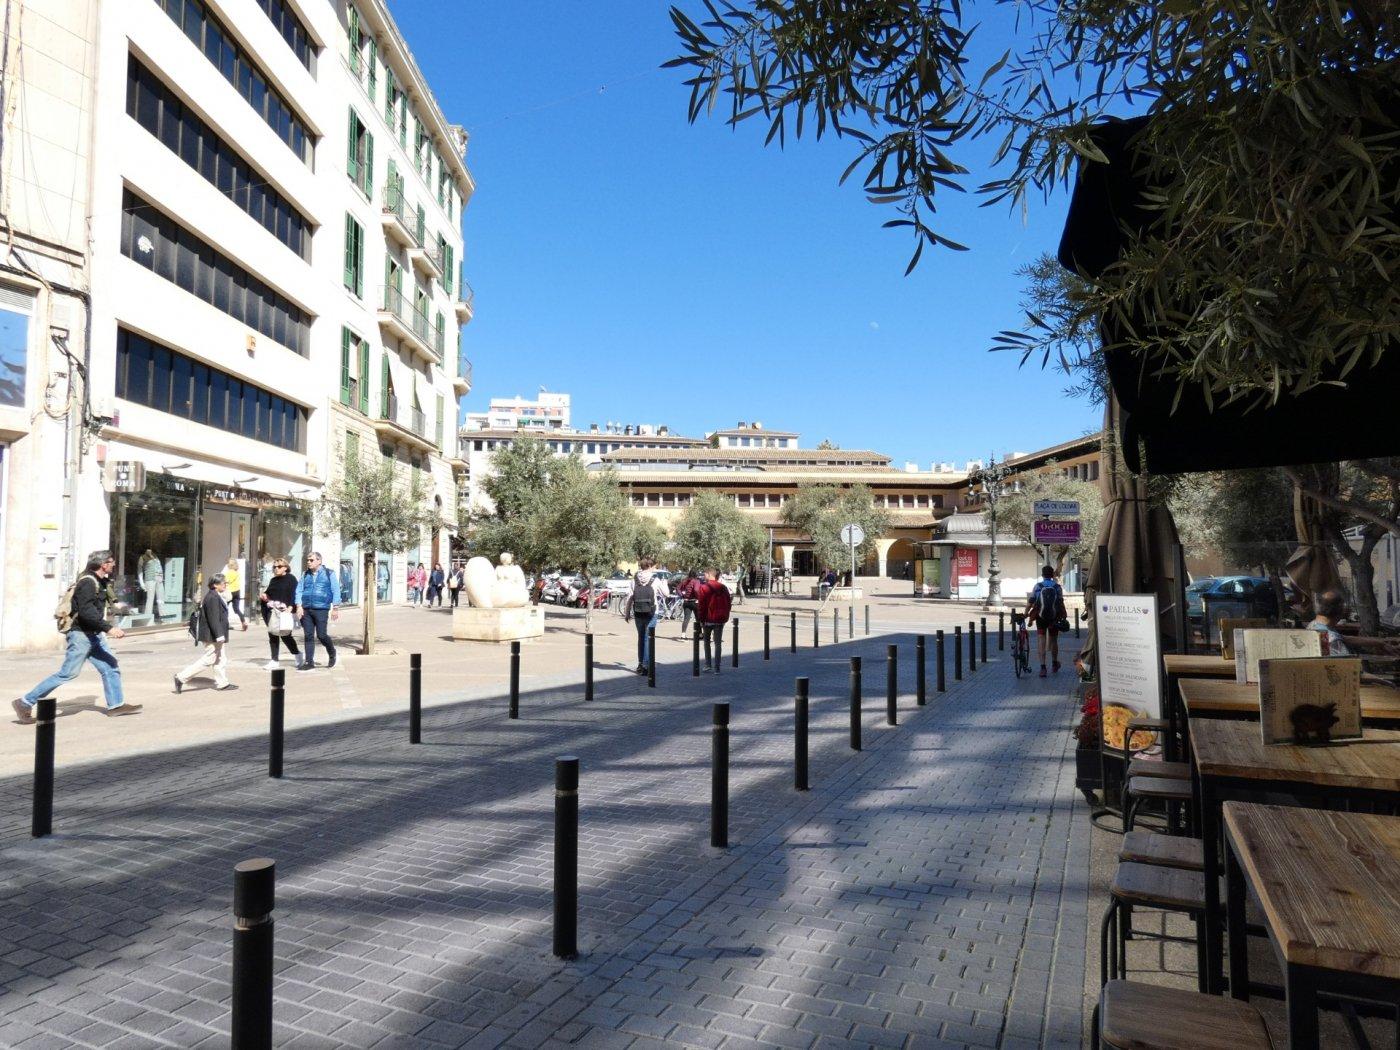 Despacho-Venta-Palma de Mallorca-185572-Foto-28